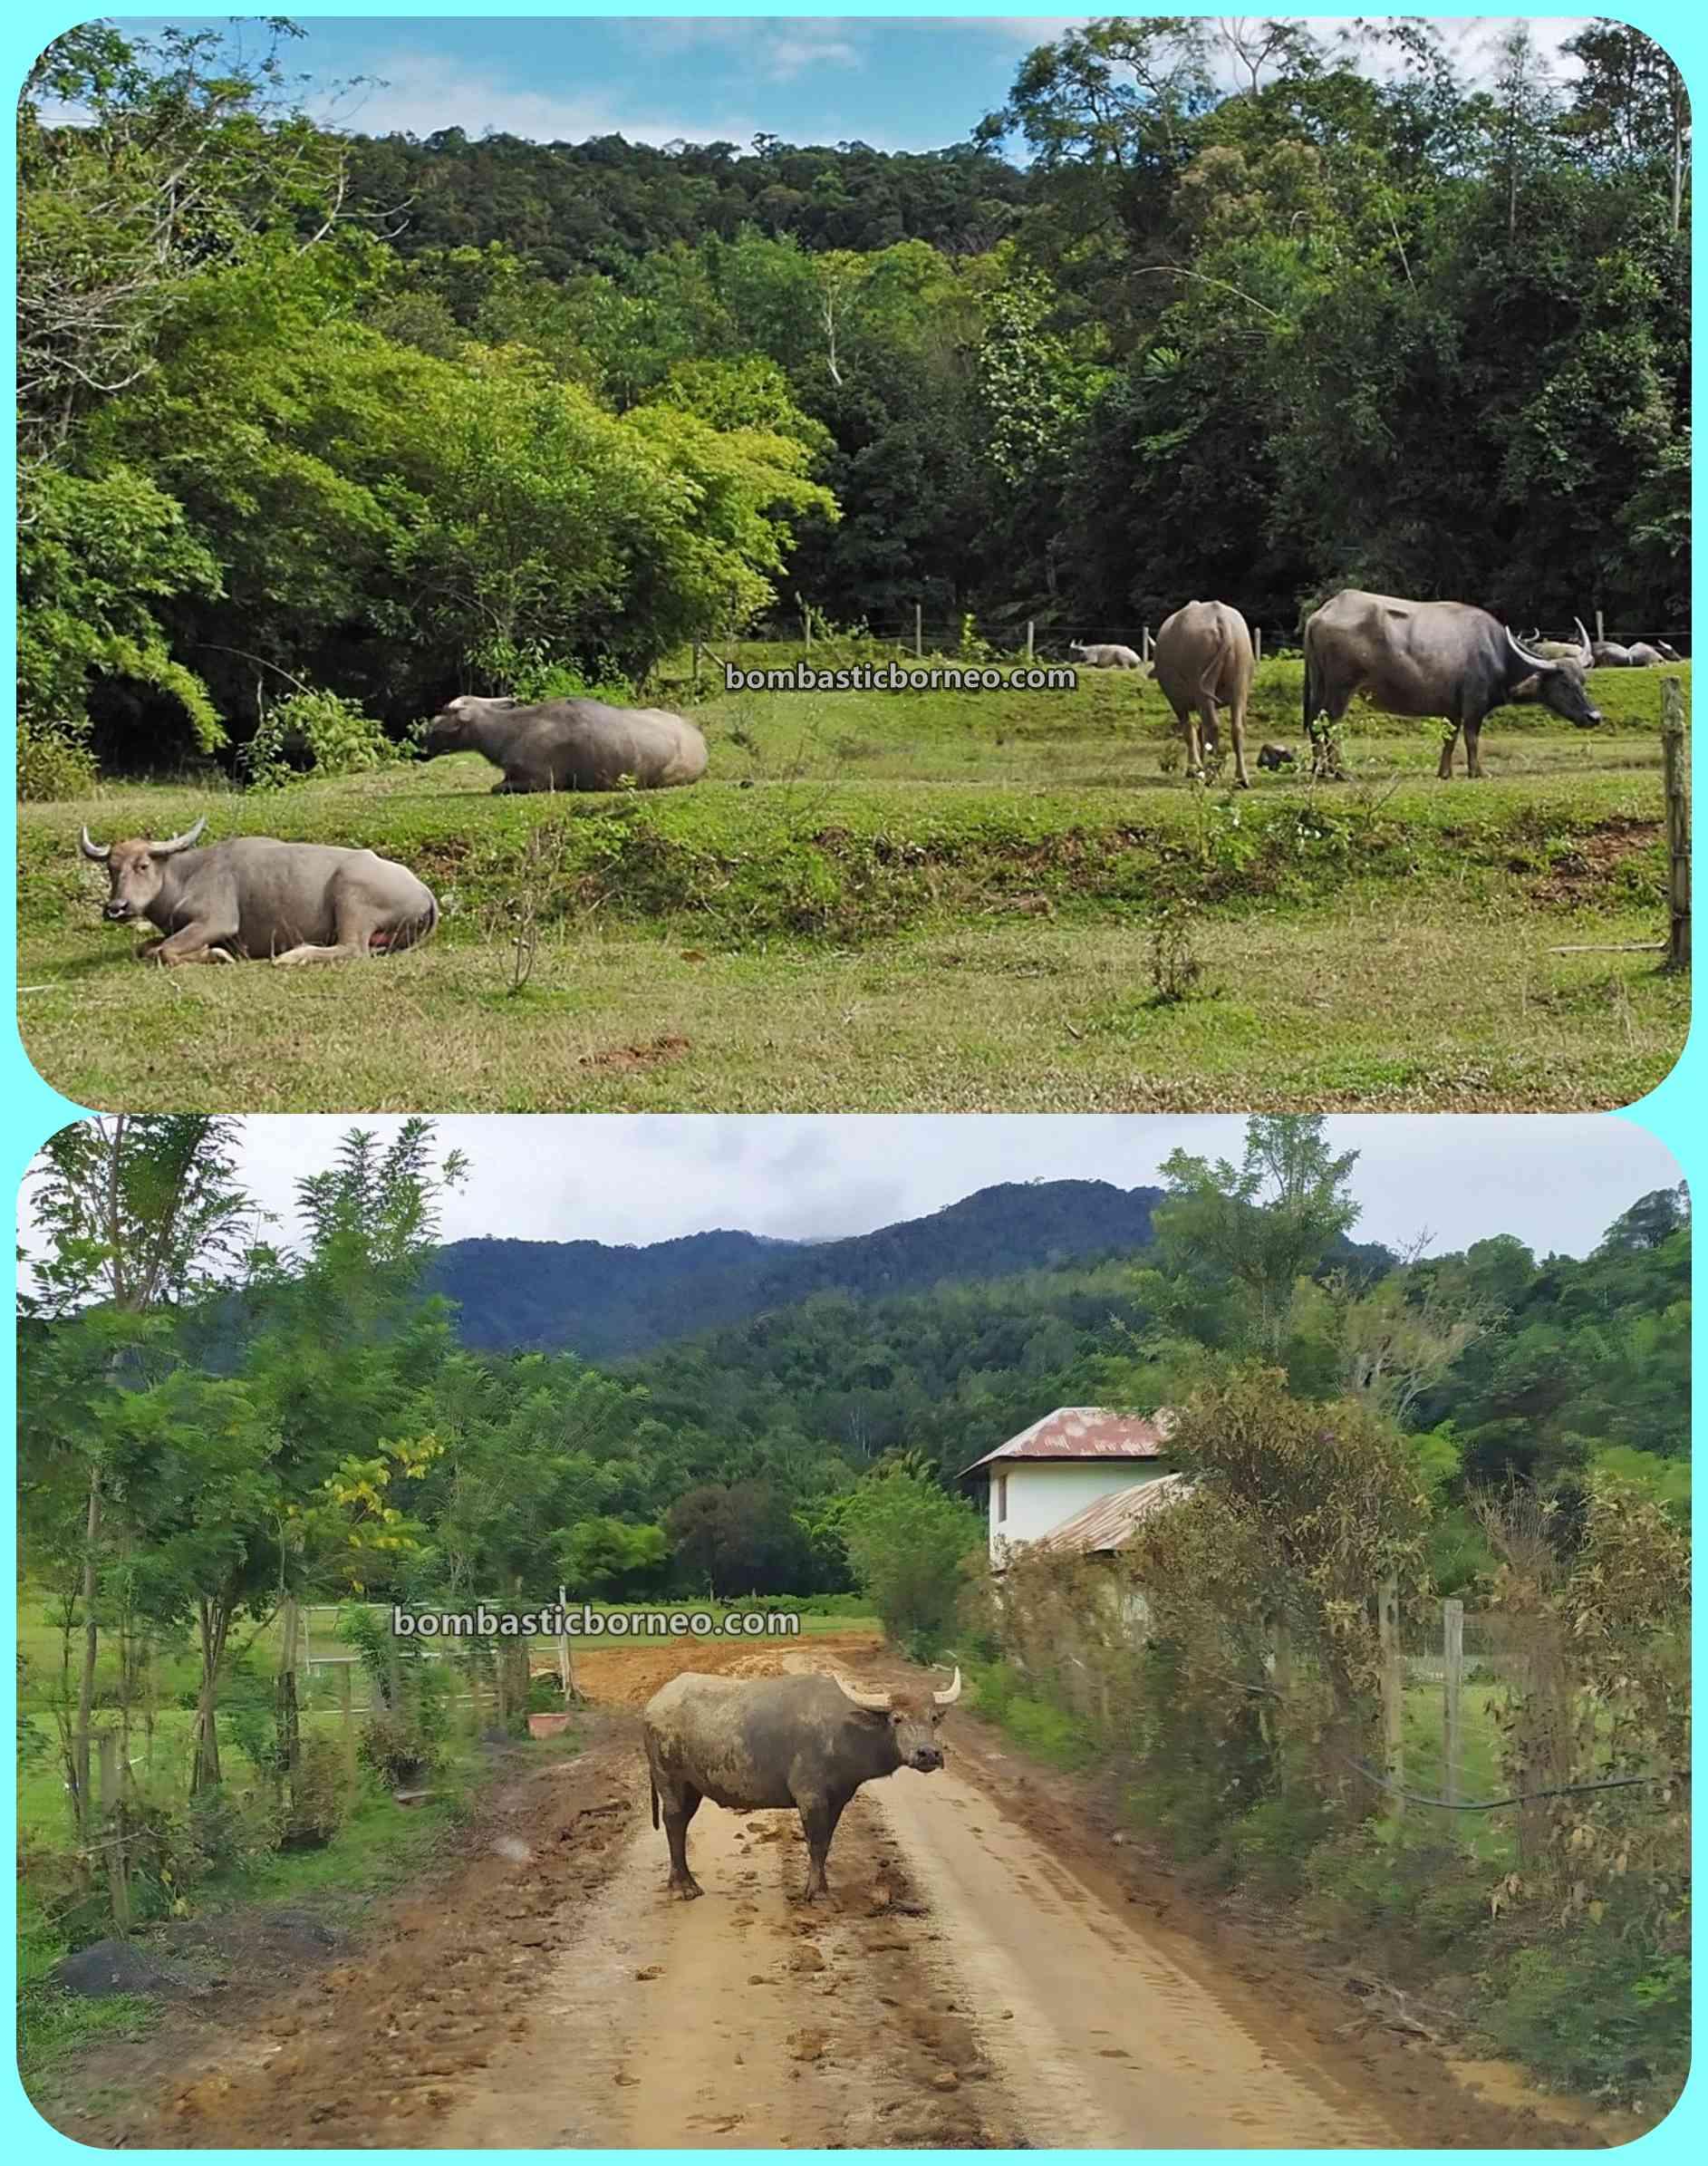 adventure, authentic, traditional, backpackers, destination, Interior, Village, native, Tourism, tourist attraction, Borneo, 穿越婆罗洲游踪, 砂拉越巴卡拉兰, 马来西亚内陆高原